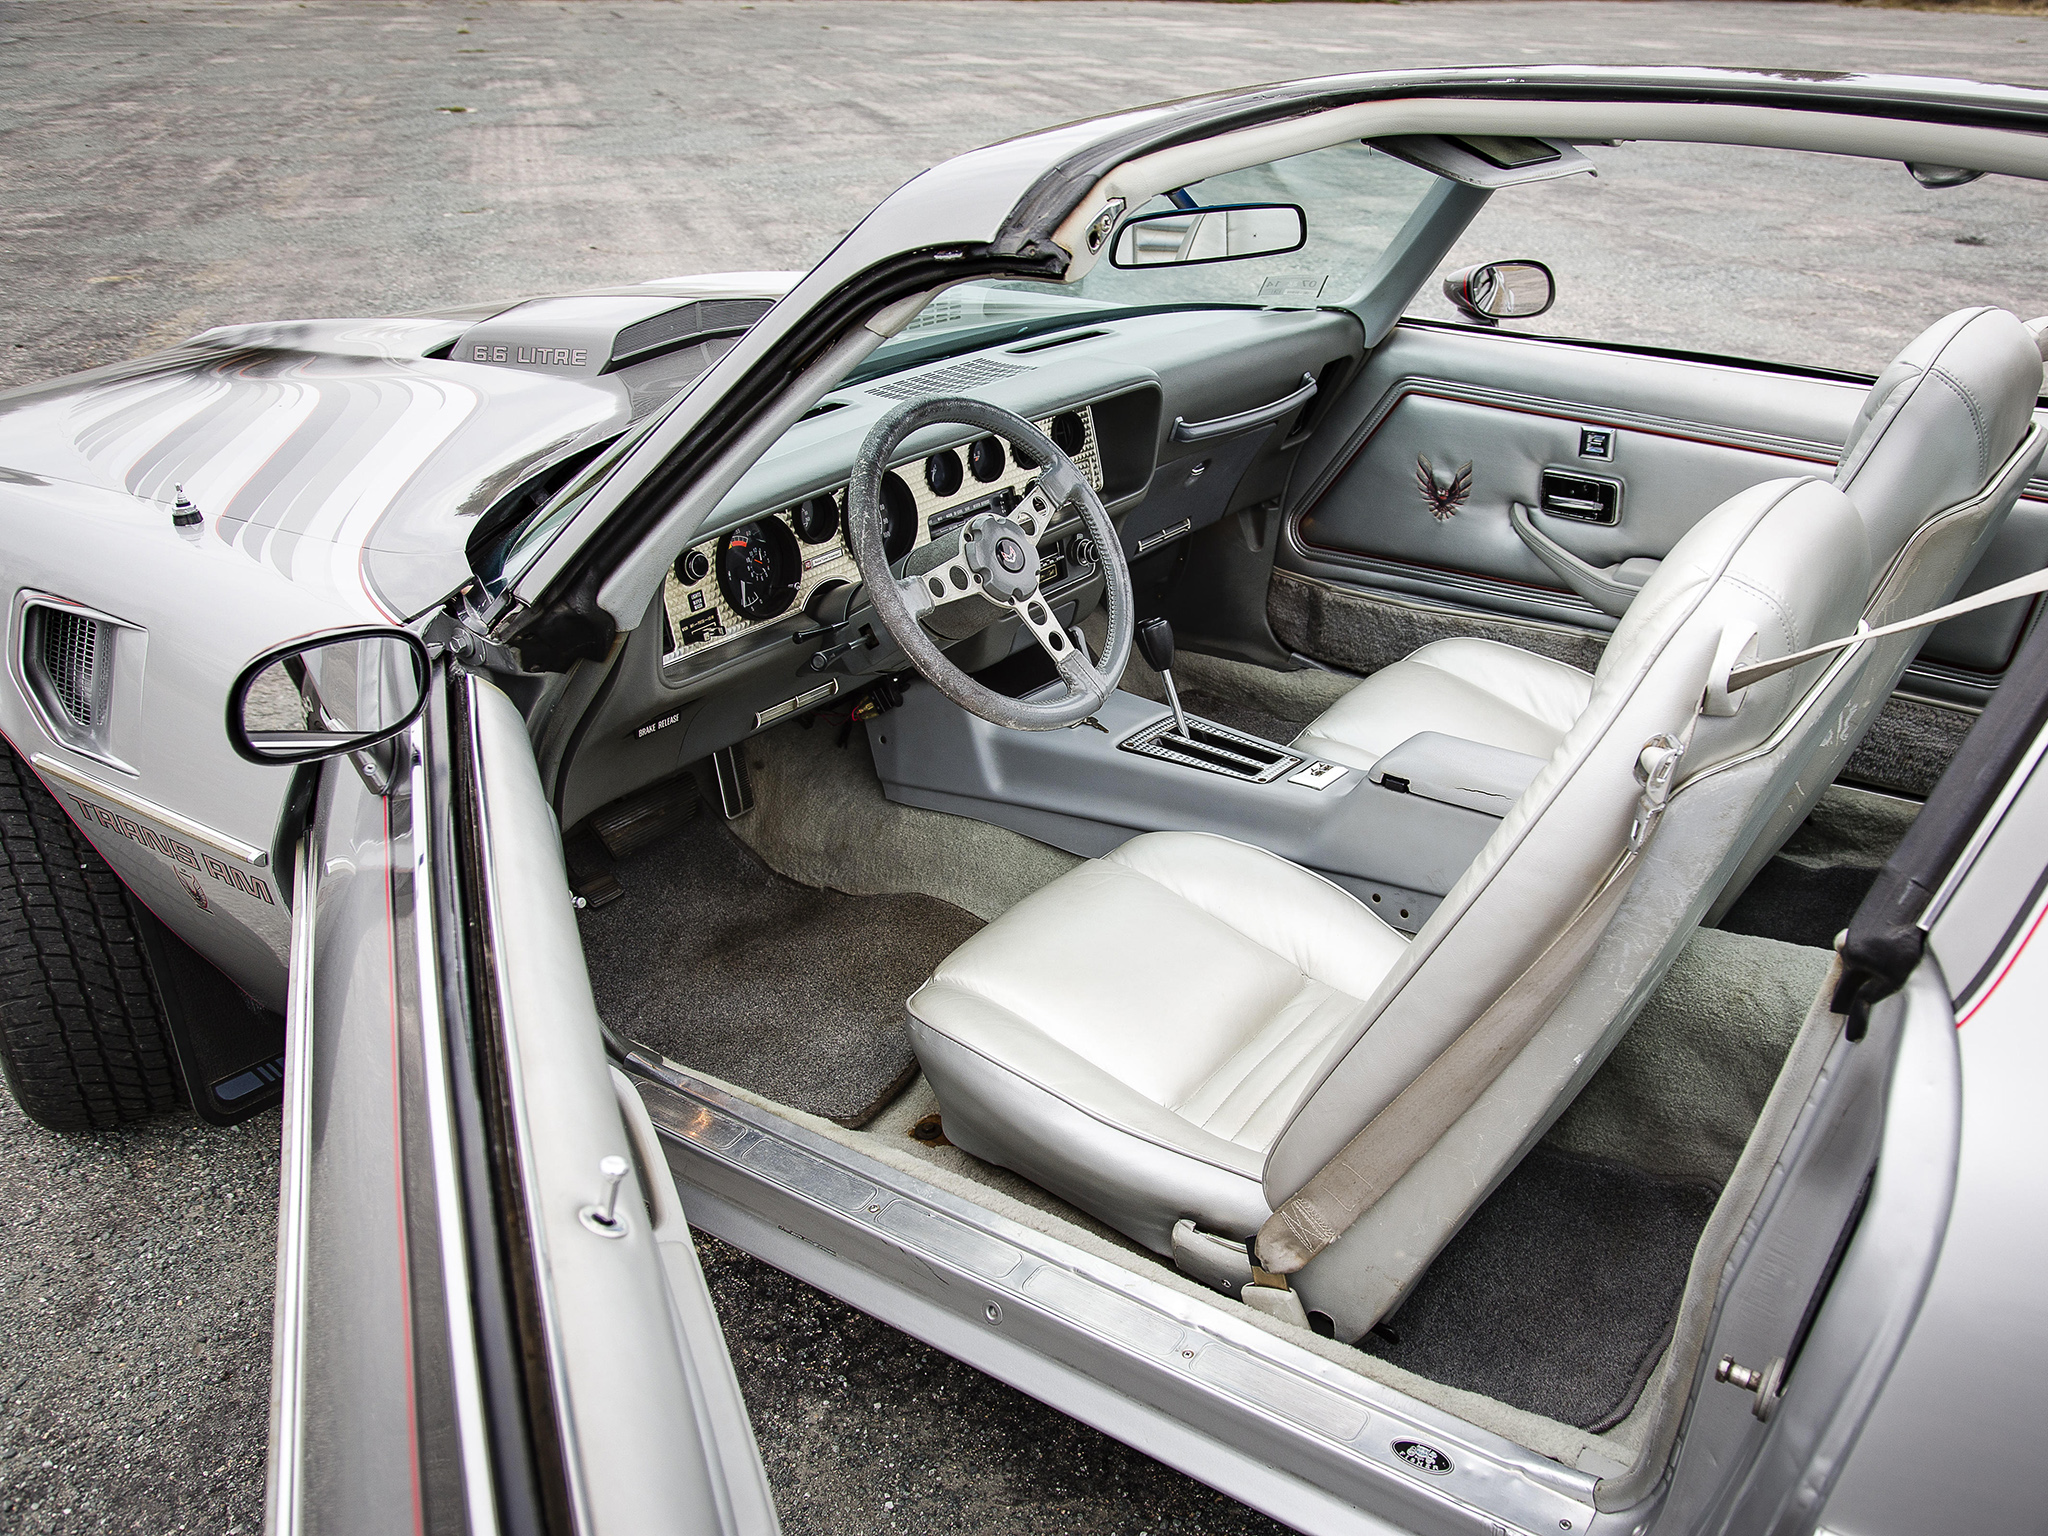 1979 Pontiac Firebird Trans Am 6-6 L80 muscle classic trans a-m